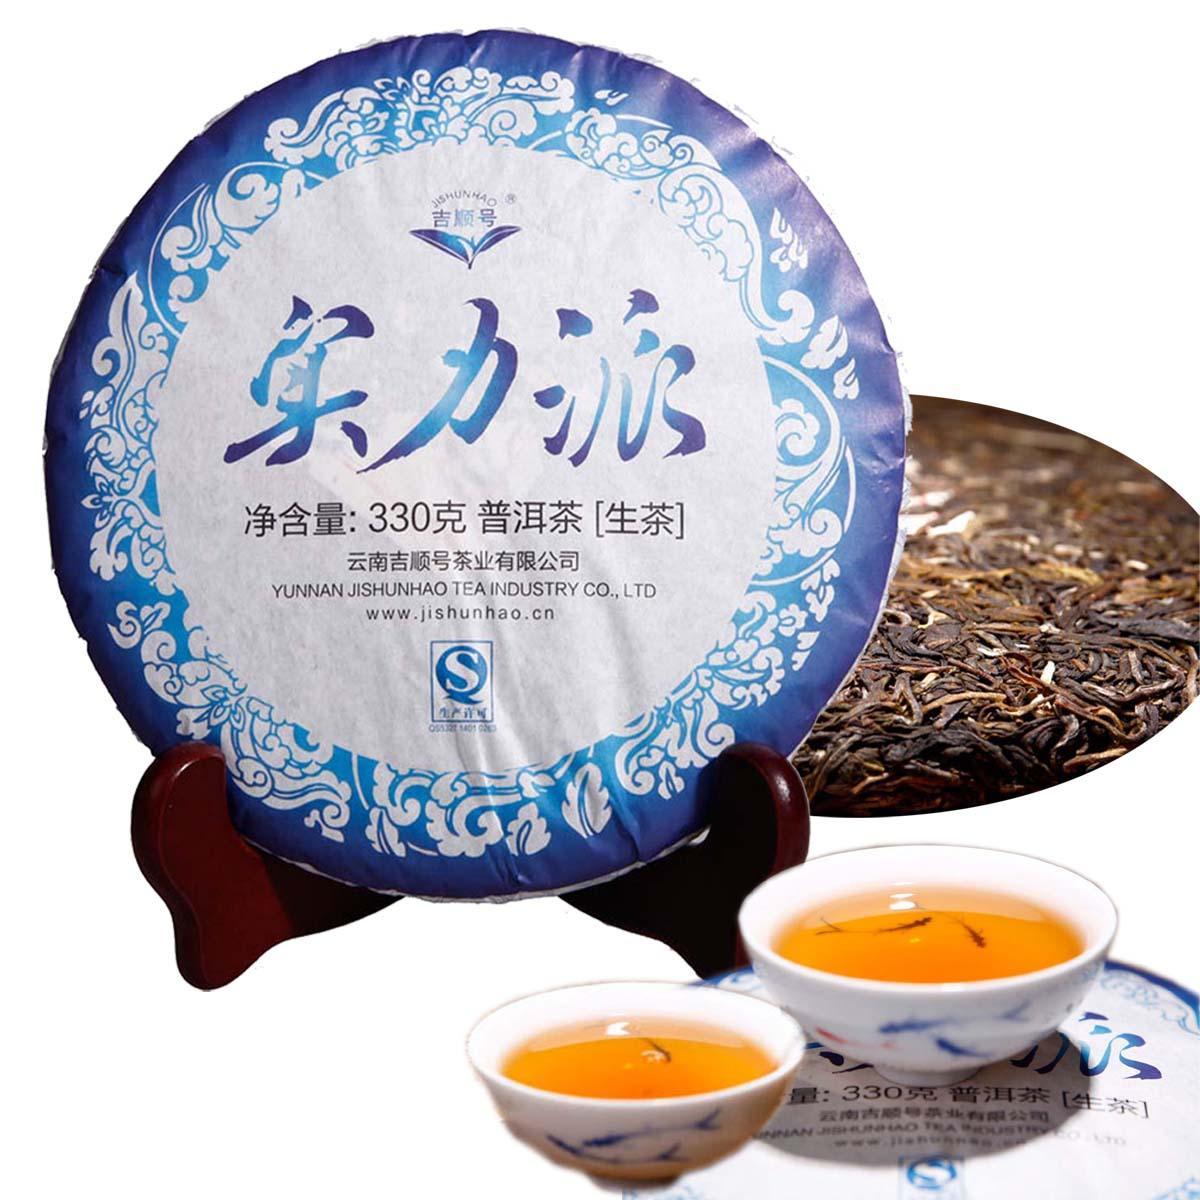 Tercih 330g Yunnan Shilipai Pu'er Çay Ham Pu Er Çay Organik Pu'er Eski Ağacı Yeşil Puer Doğal Puerh Çay Kek